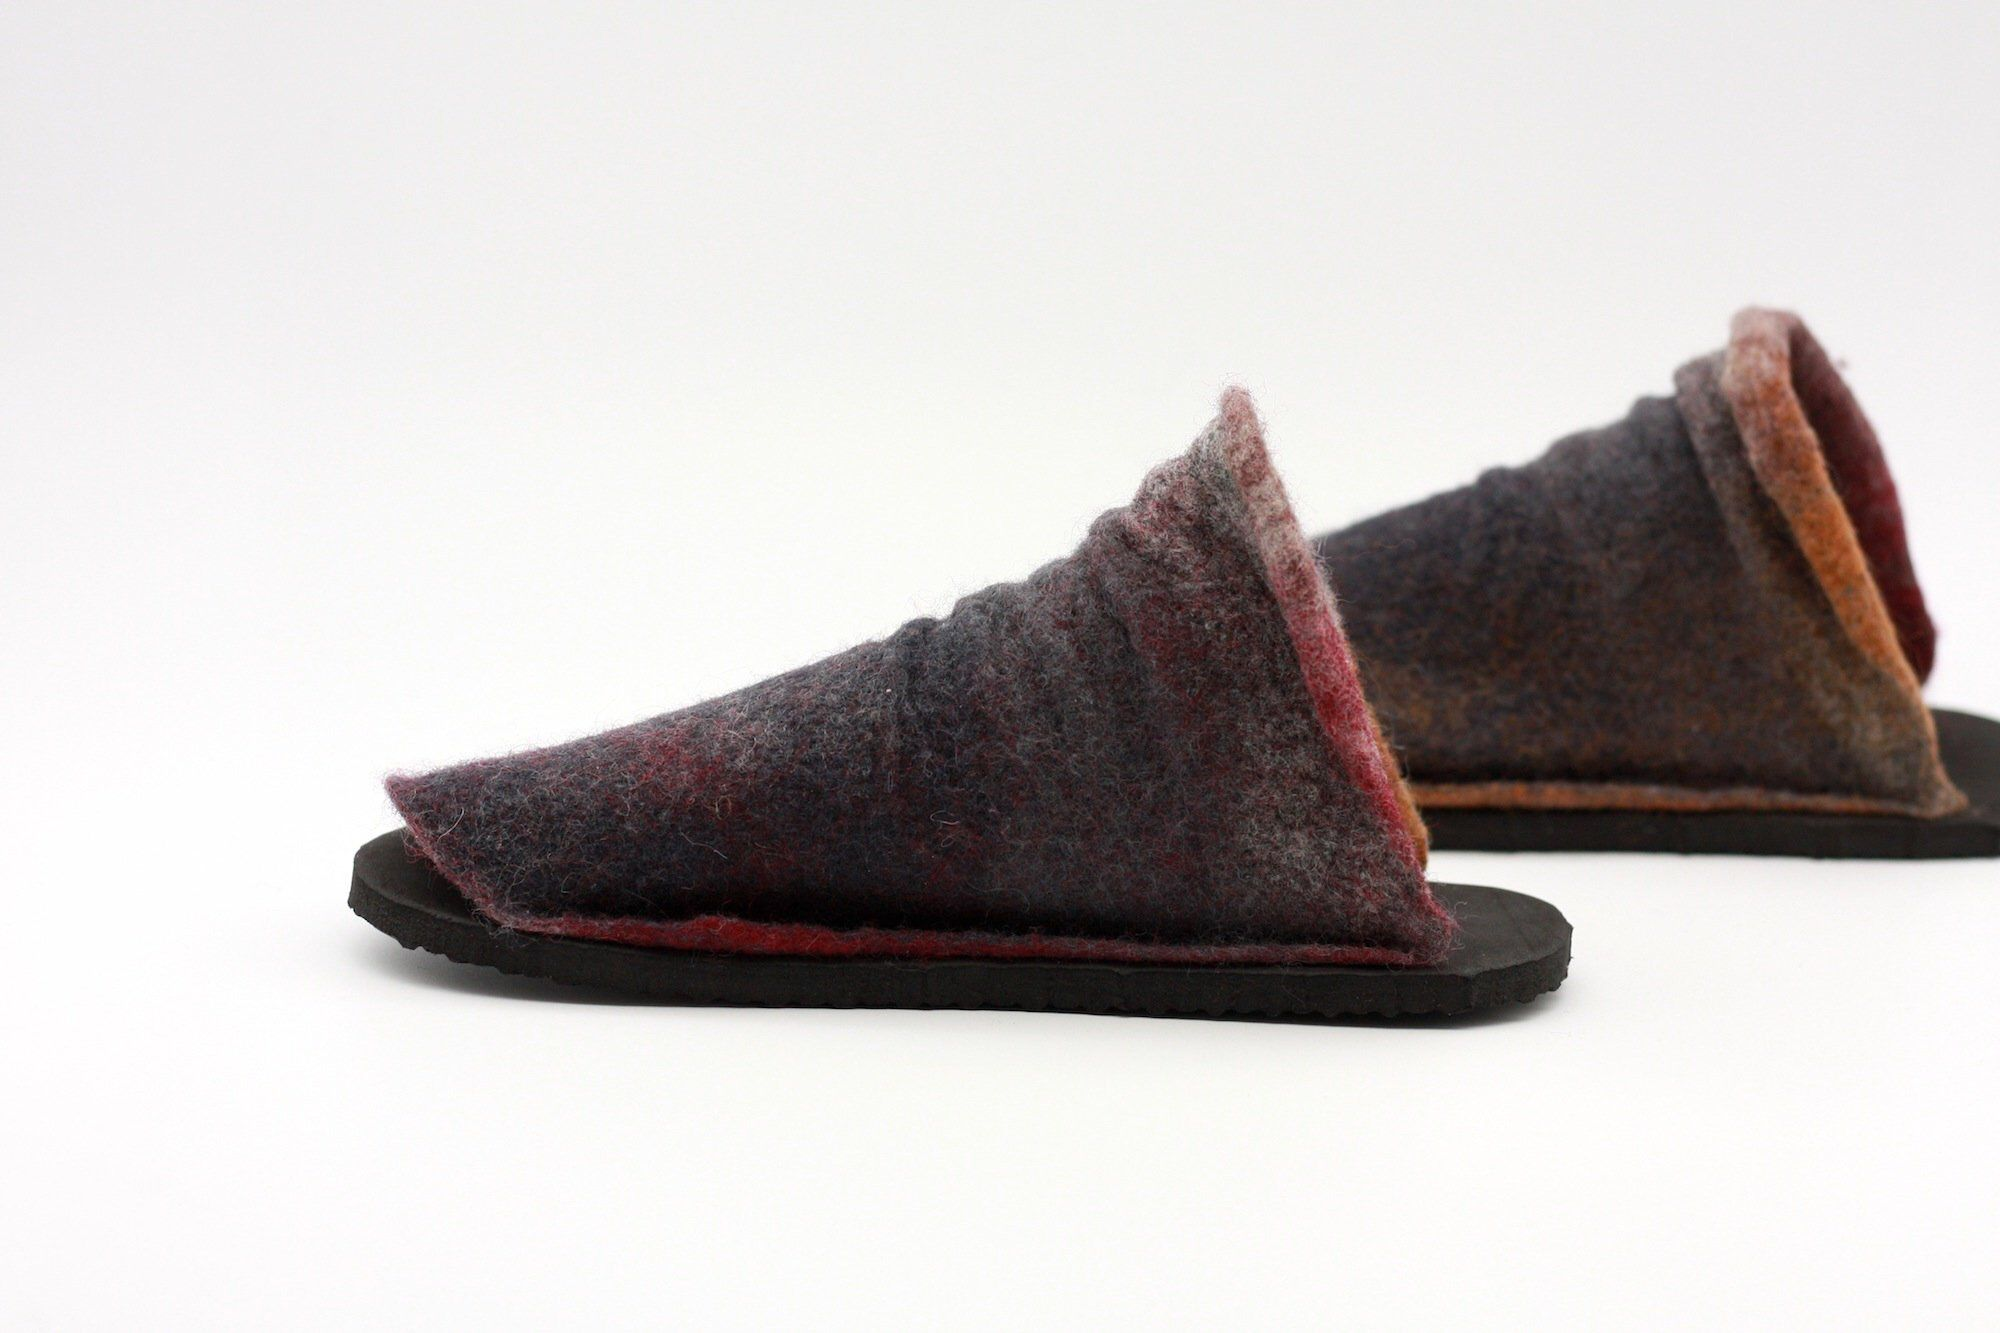 0fa39c2645f69 Pin by lucielalune on = lucielalune footwear = | Sandals, Wool Felt ...